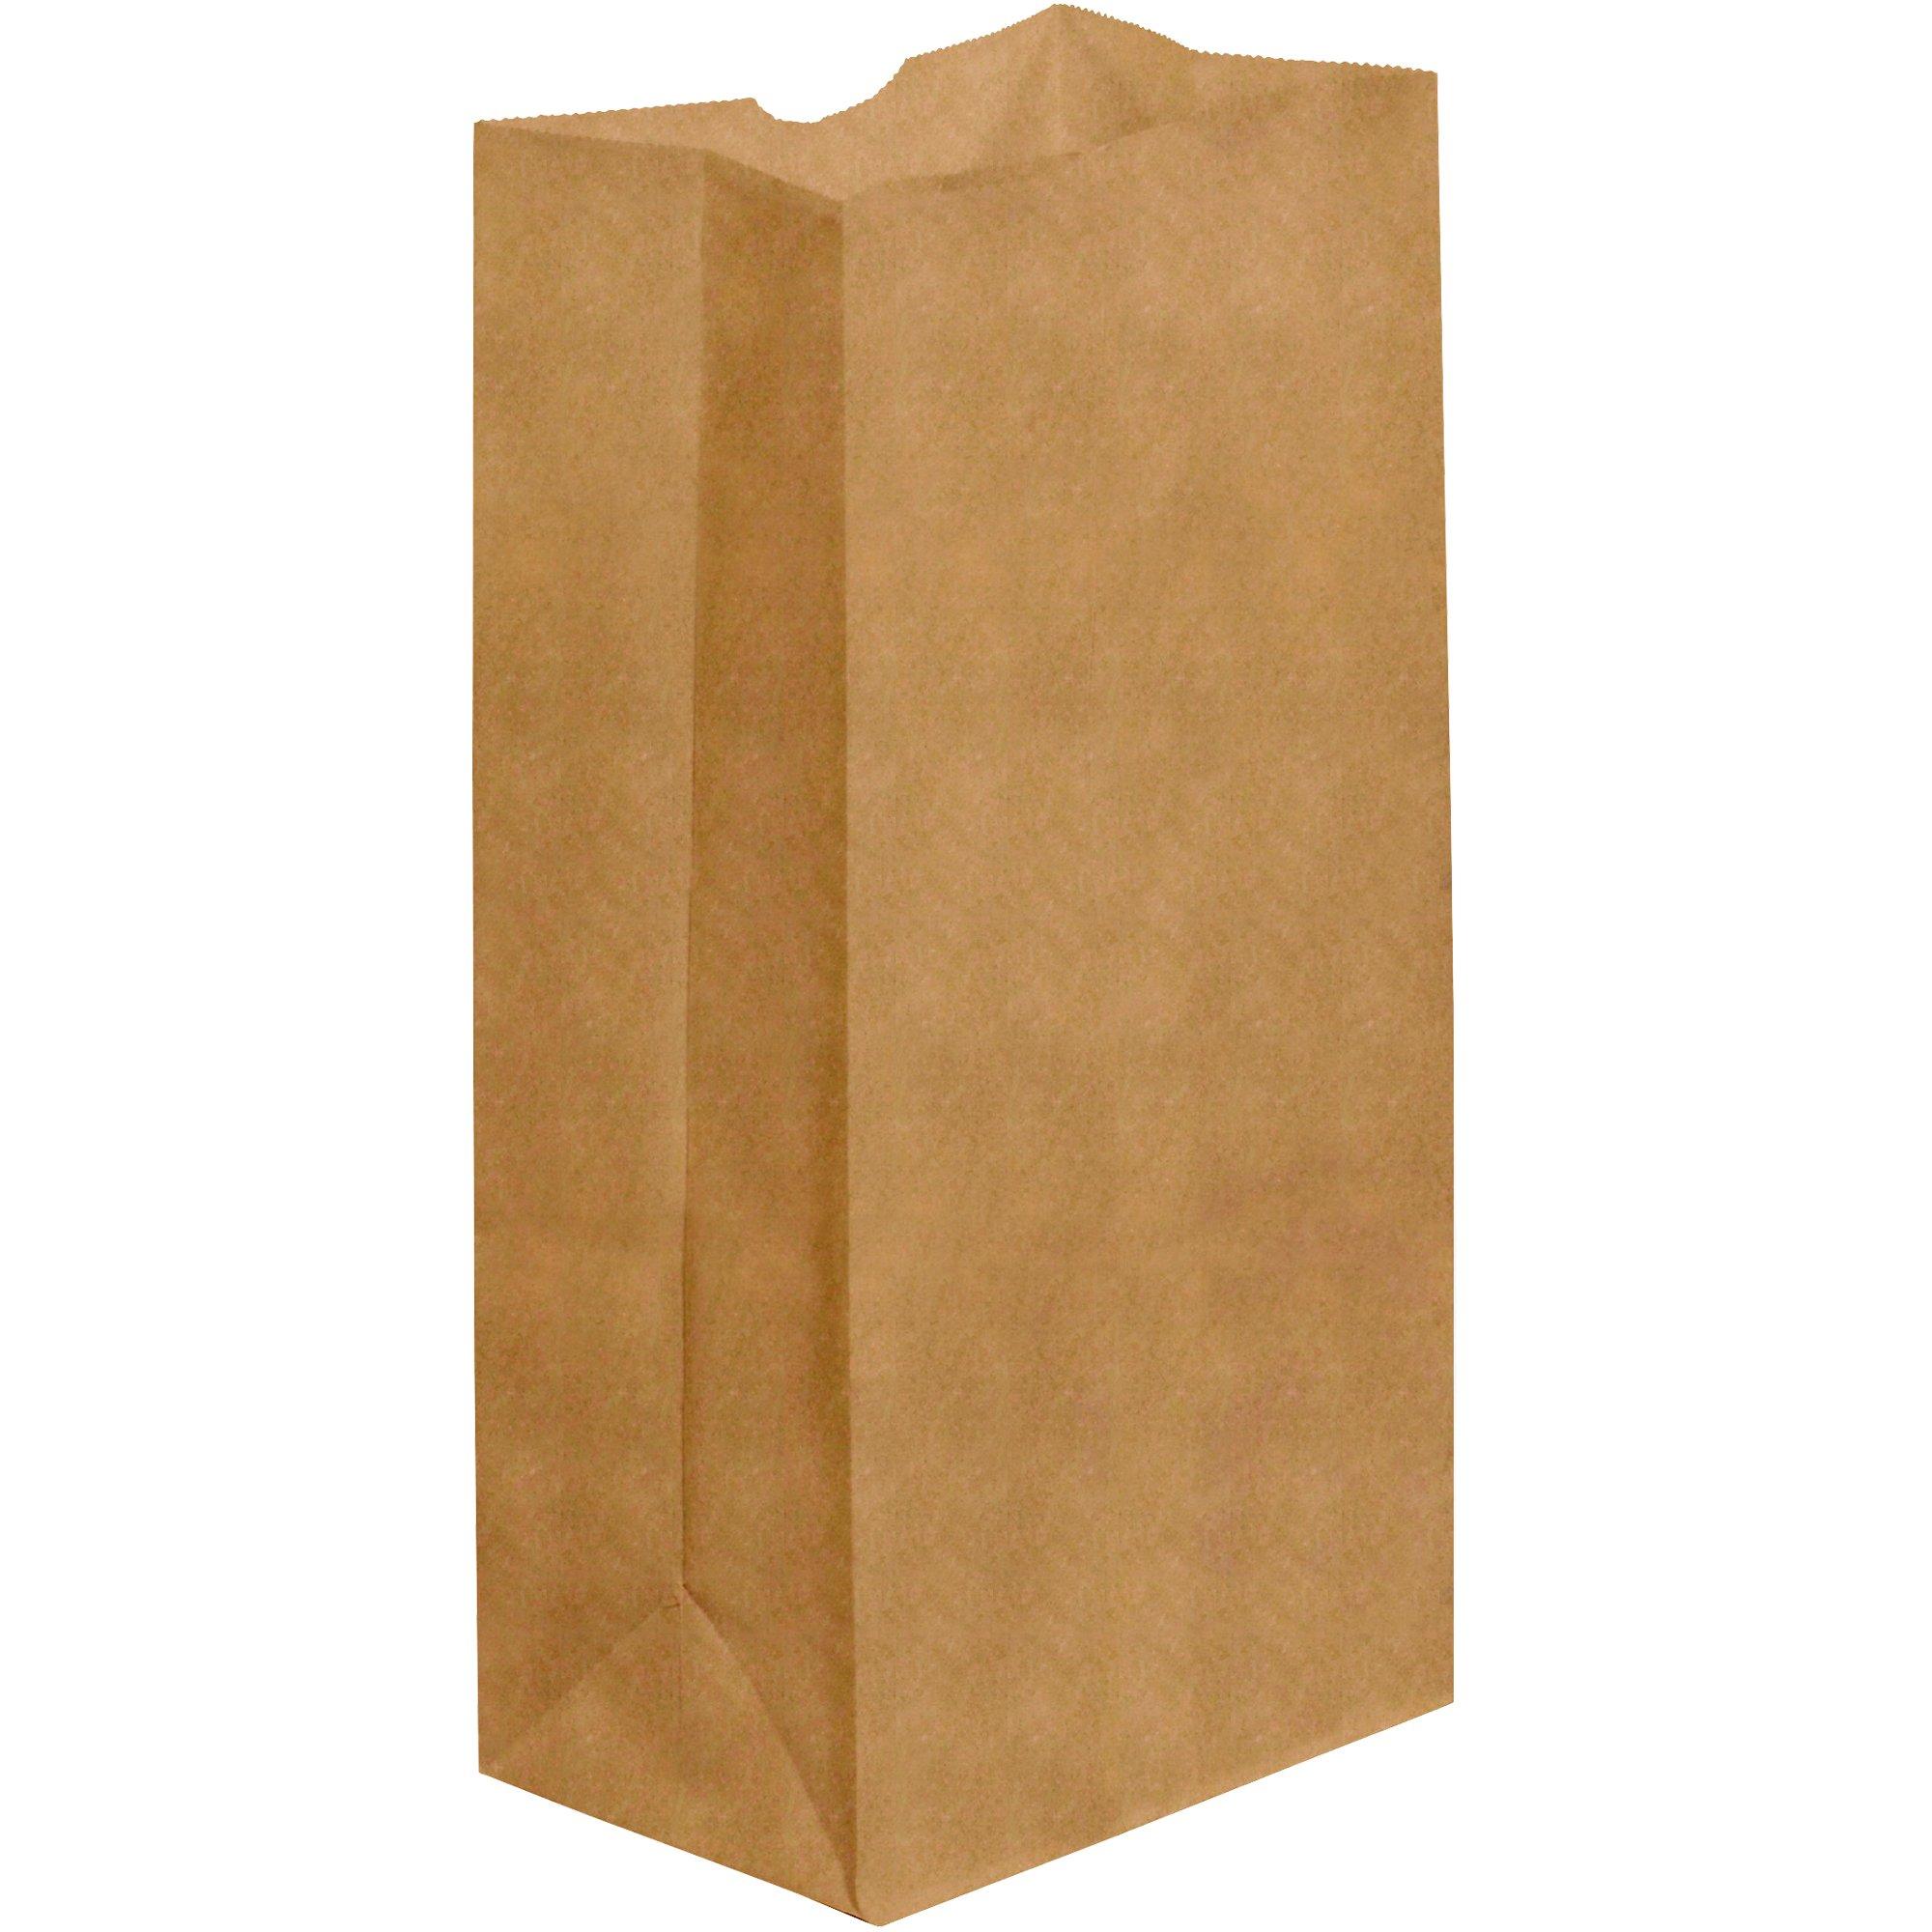 BOX USA BBGG107K Grocery Bags, 7 1/8'' x 4 1/2'' x 13 3/4'', Kraft (Pack of 500)